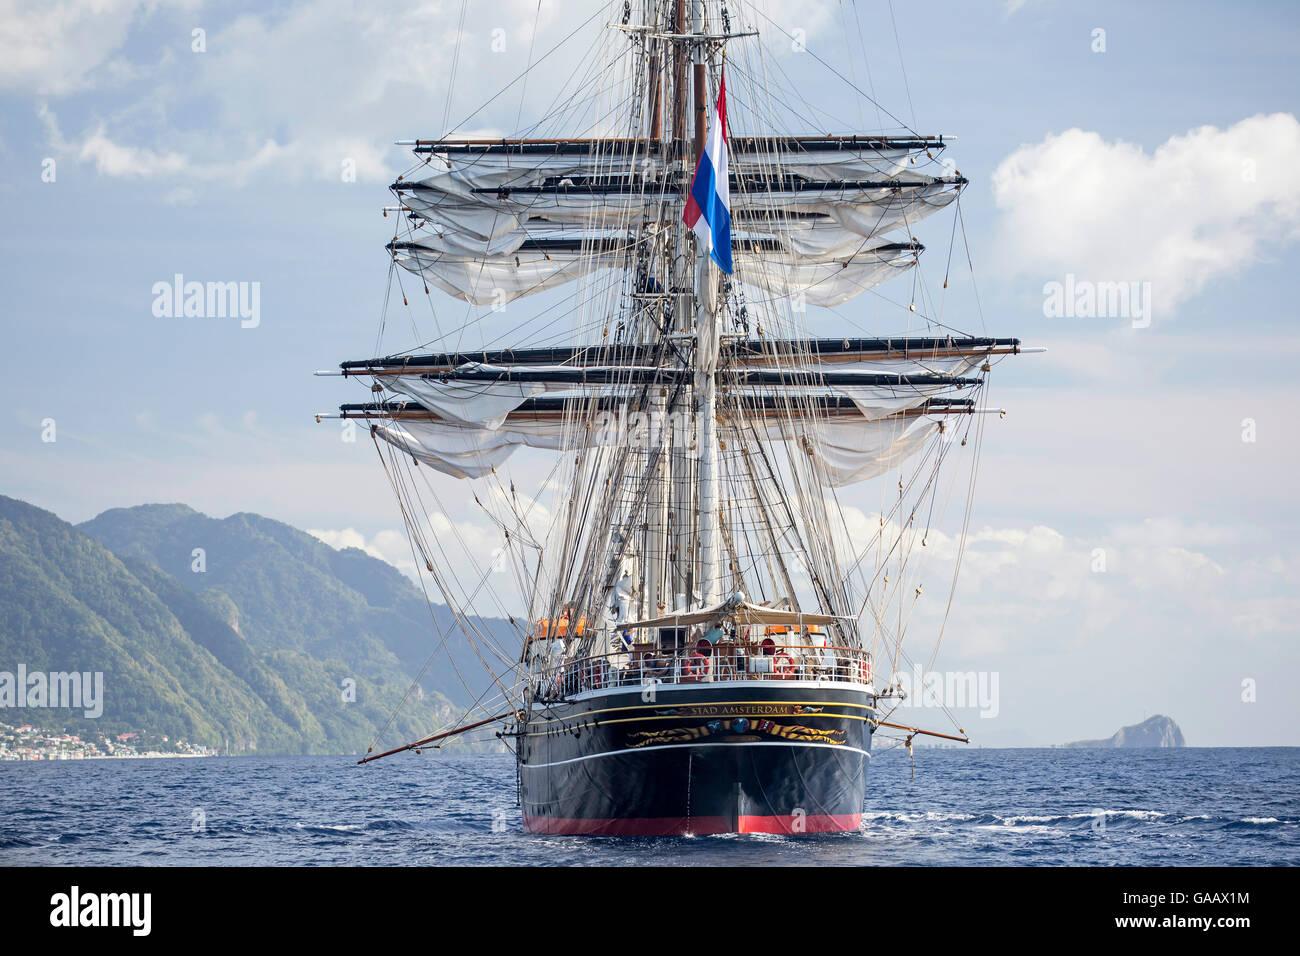 Three-masted clipper cruising ship 'Stad Amsterdam', Dominica, Caribbean Sea, Atlantic Ocean. All non-editorial - Stock Image